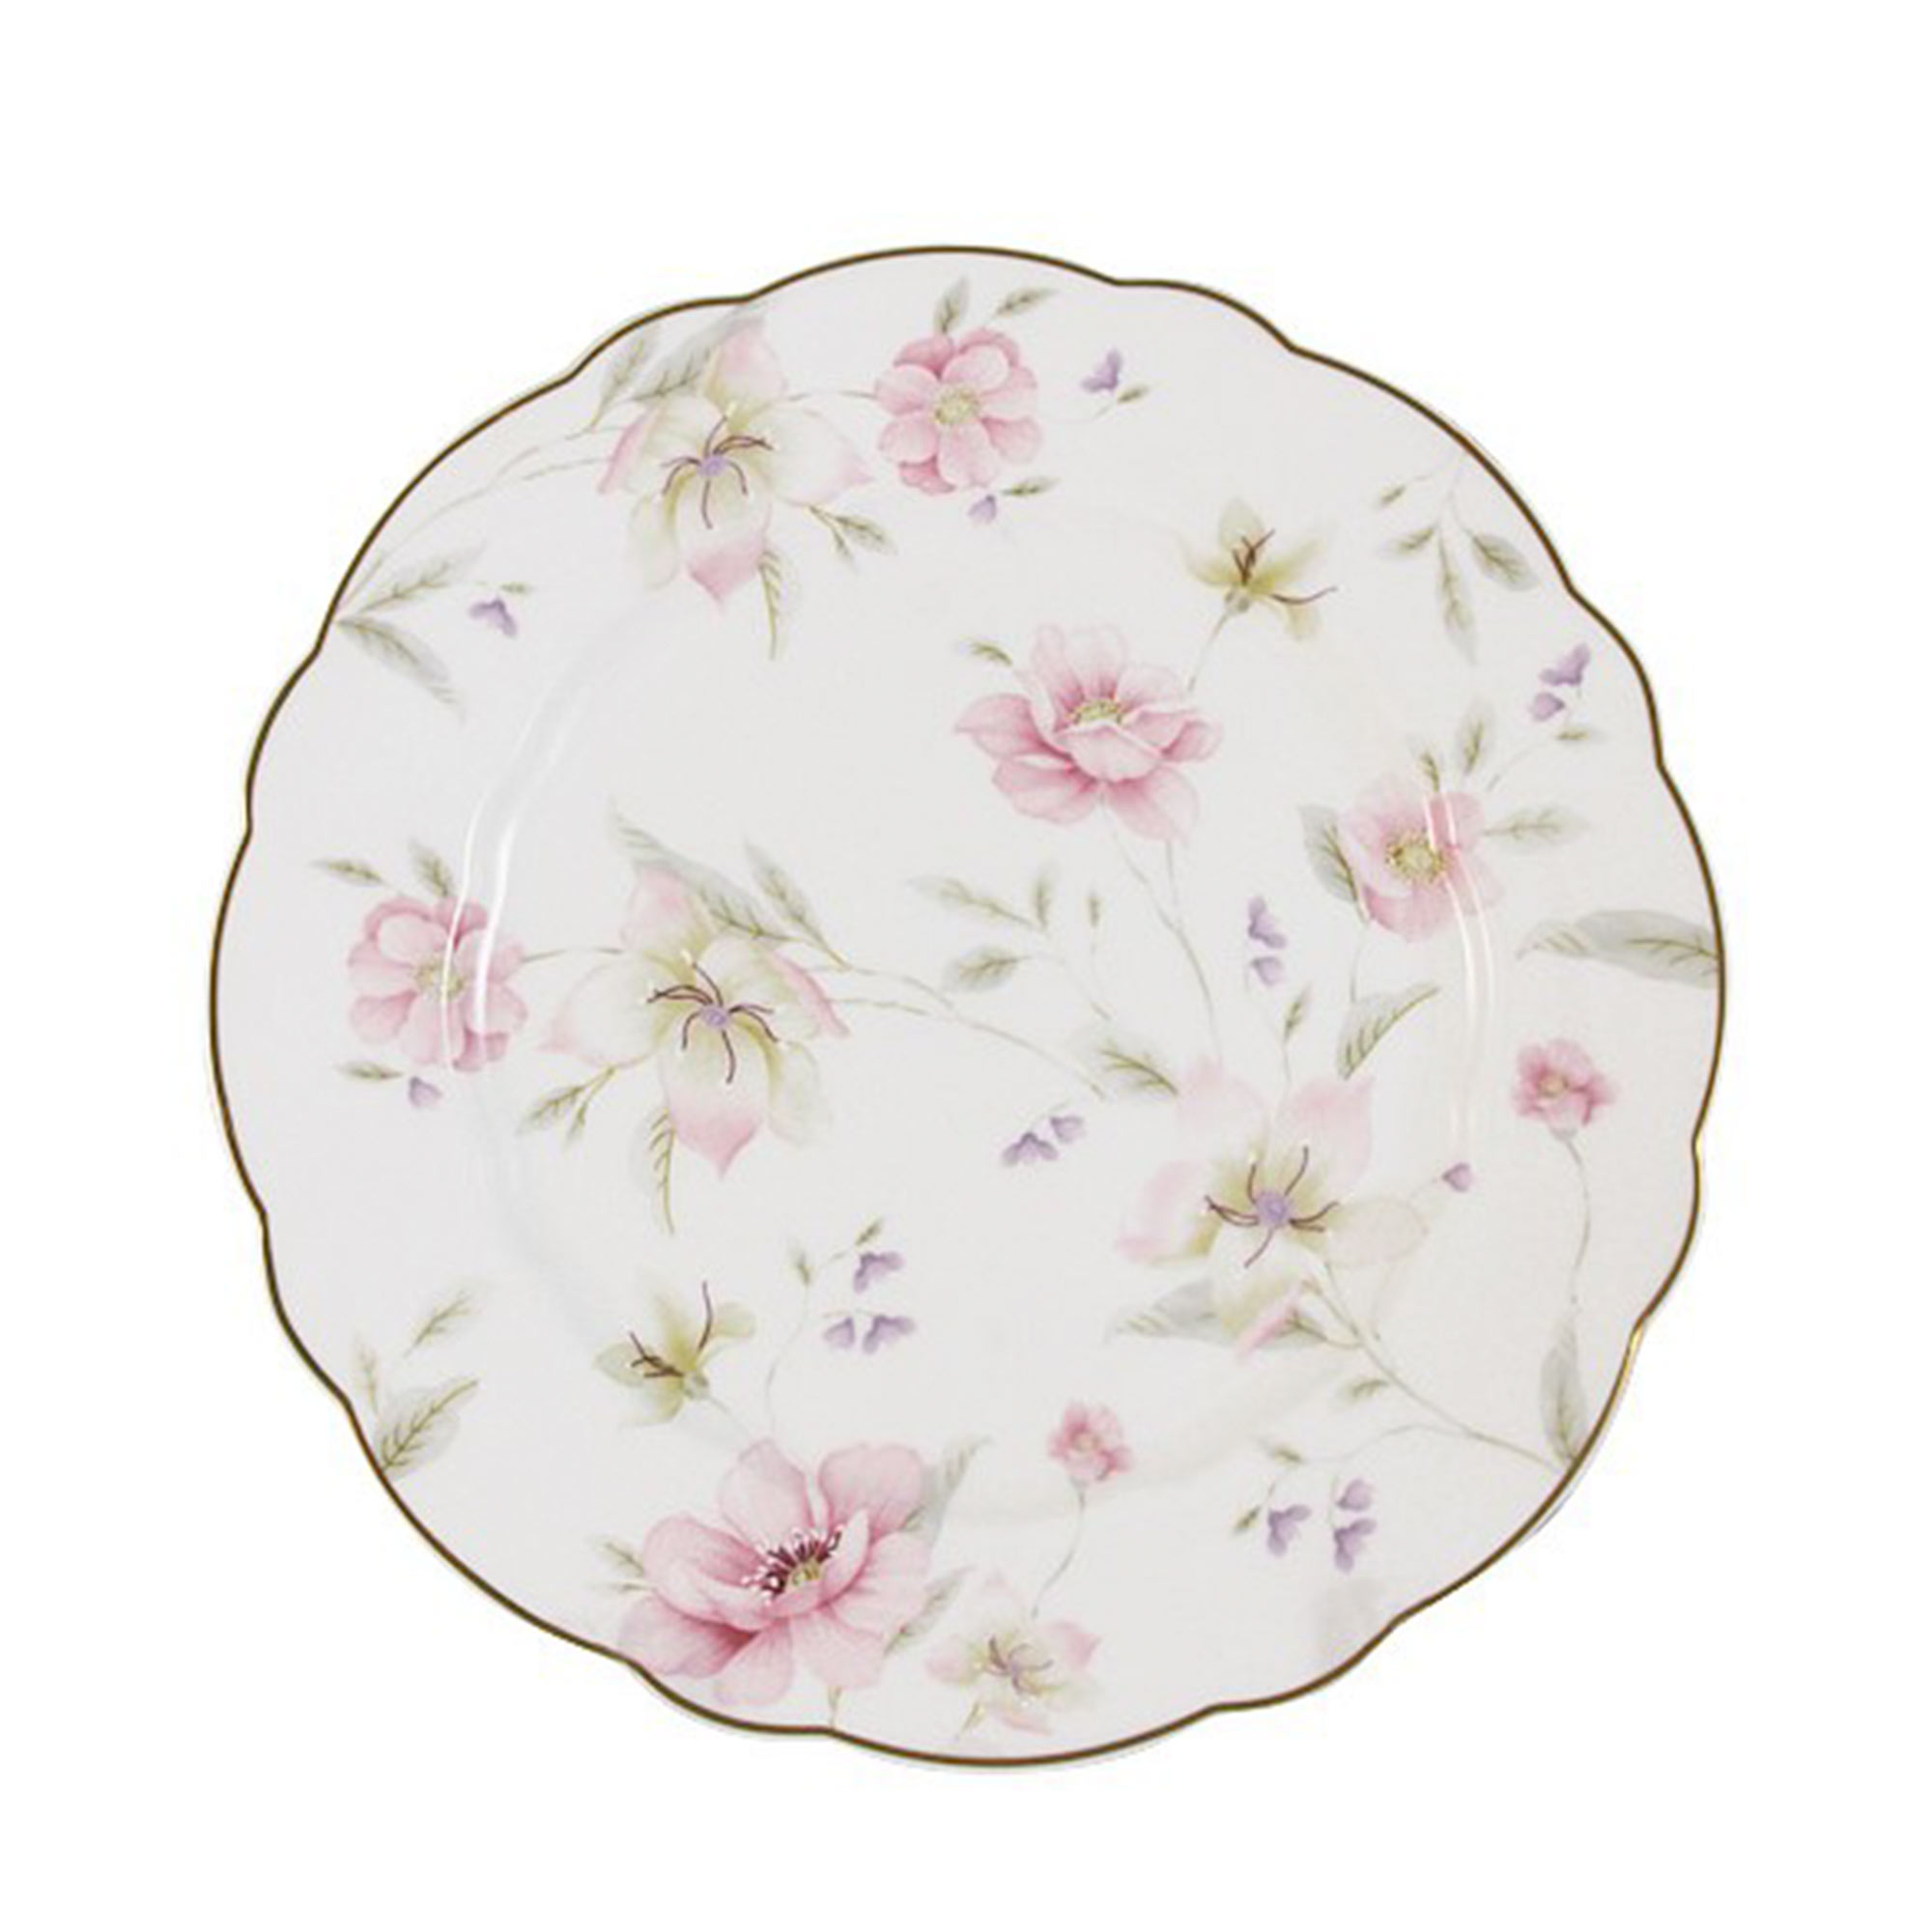 Тарелка Anna Lafarg Розовый танец 20 см тарелка закусочная anna lafarg emily kamelia 19 см